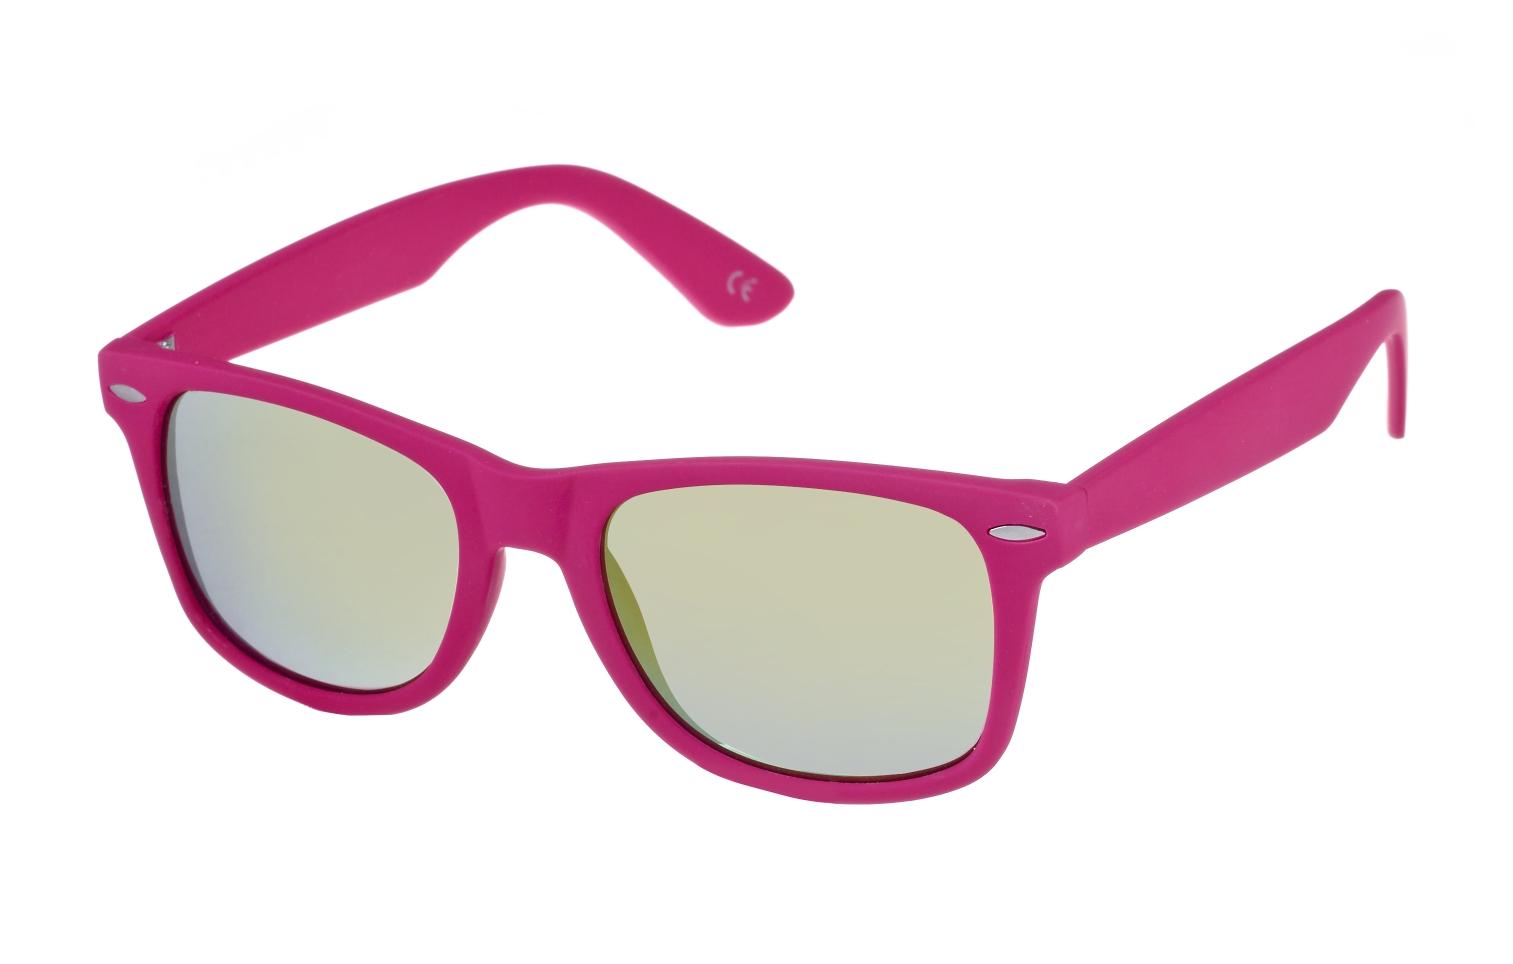 Pink Sunglasses _6, 7.99 Euro, 12.90 CHF, 31.90 PLN